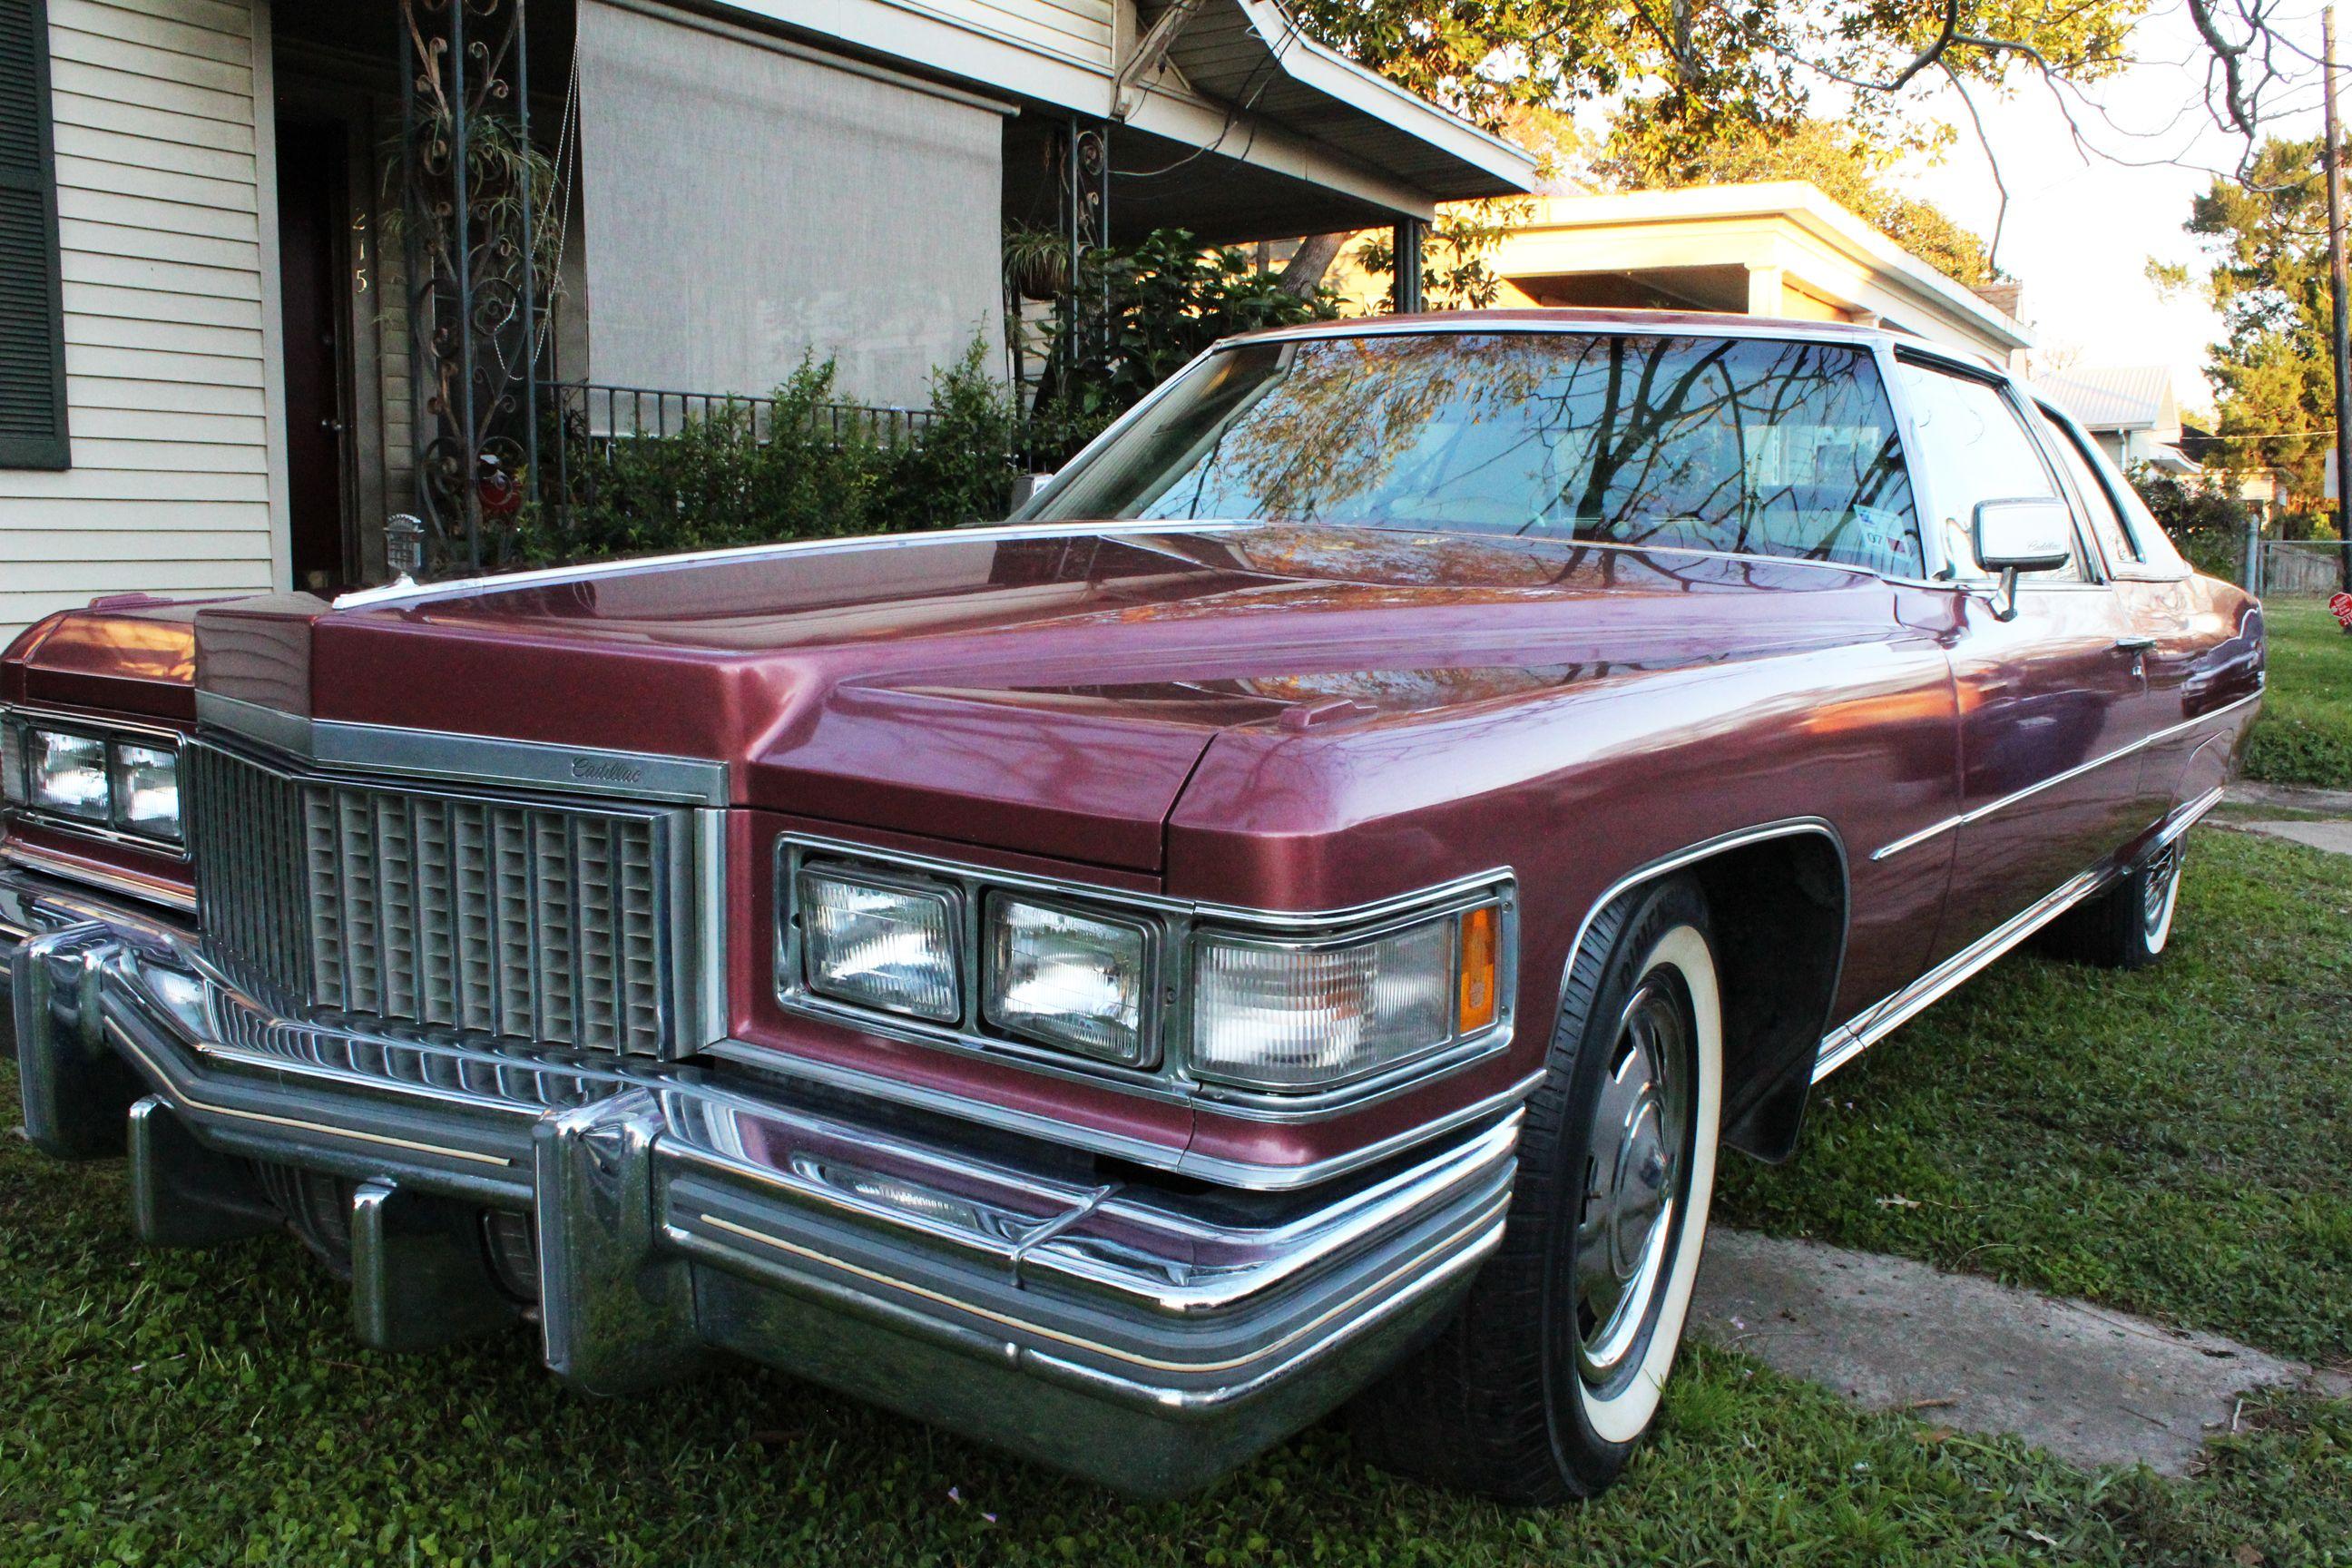 1975 Cadillac Coupe DeVille Amazing Condition!! 54,268 Miles - $8000 ...